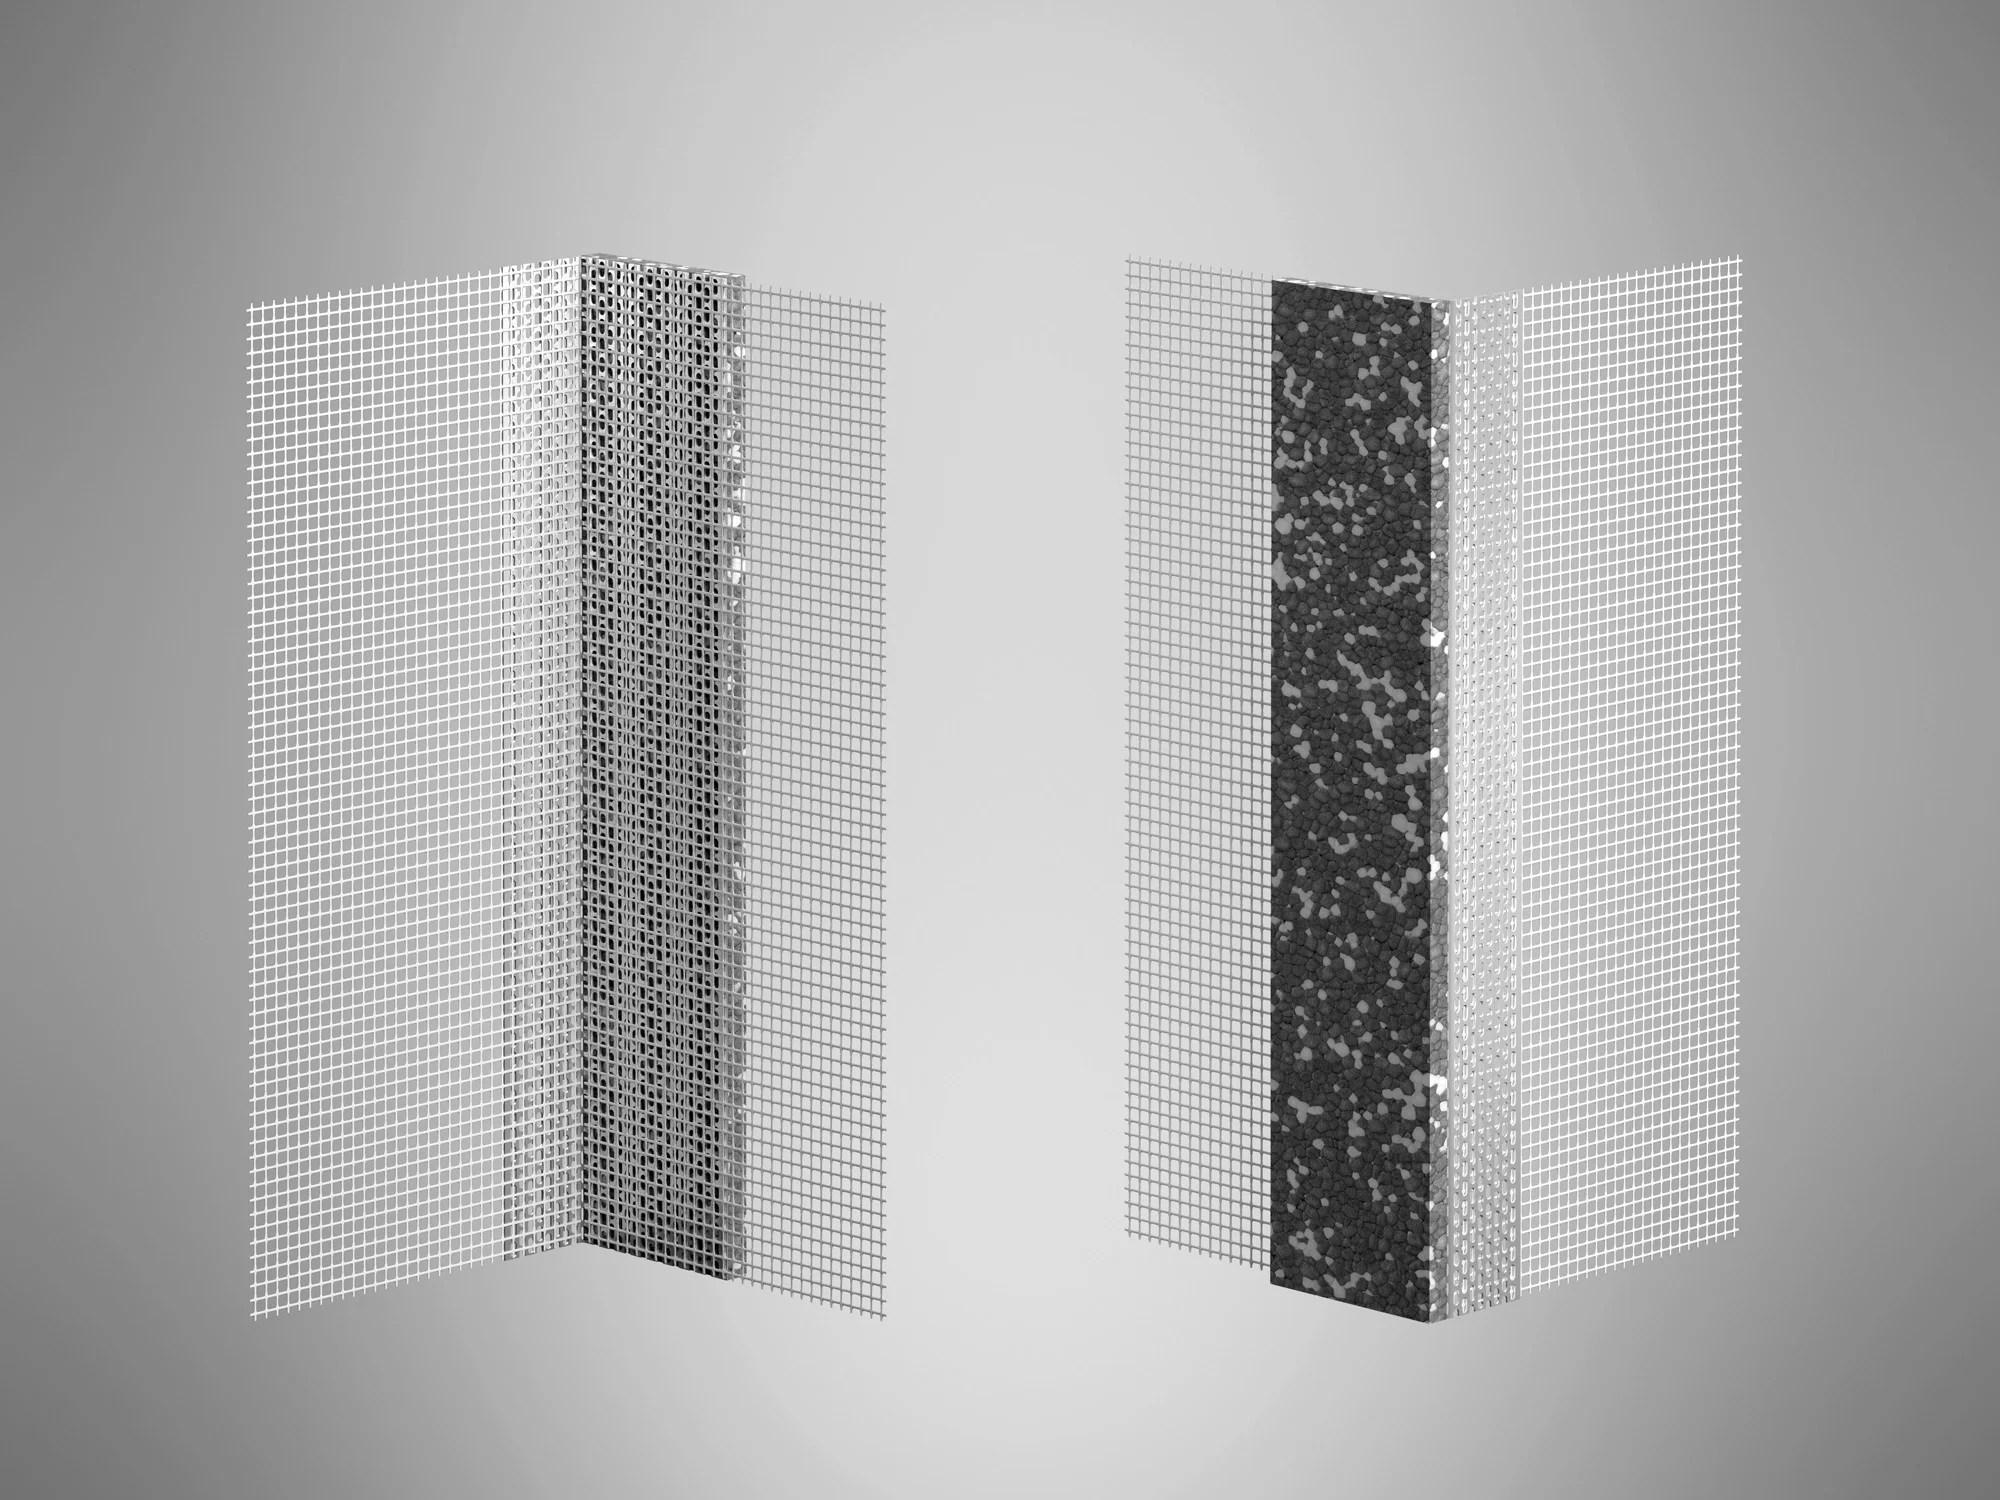 Abdichtung Erdberührter Bauteile | Bauphysik | News/Produkte